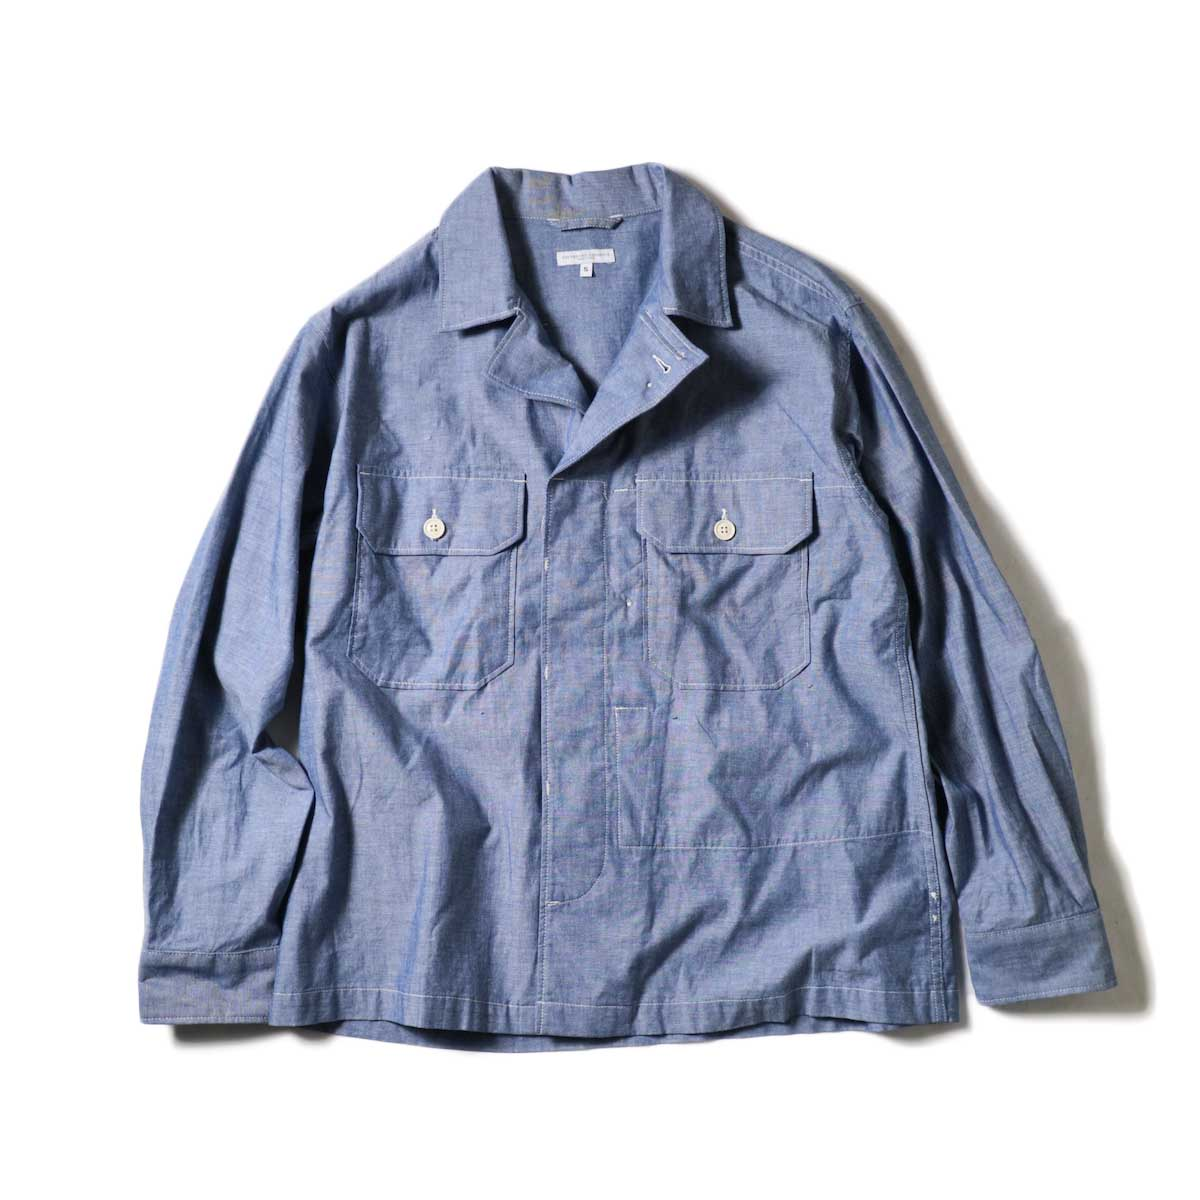 Engineered Garments / MC Shirt Jacket -Cotton Chambray (Blue)フラップ開